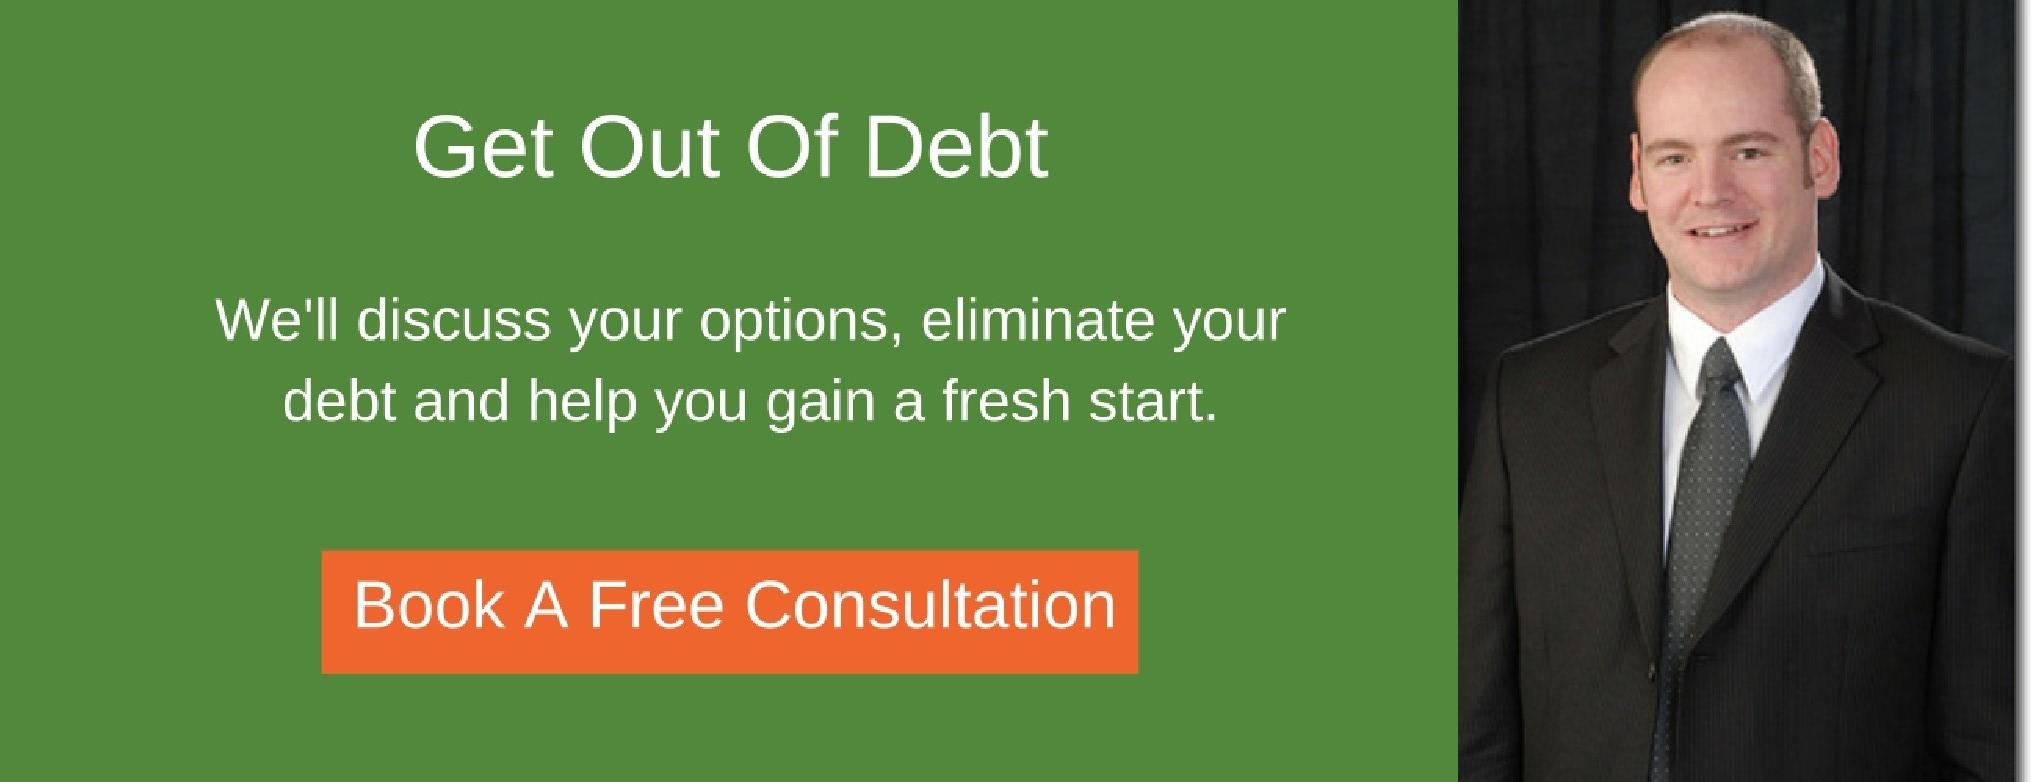 get-out-of-debt-howard-cta